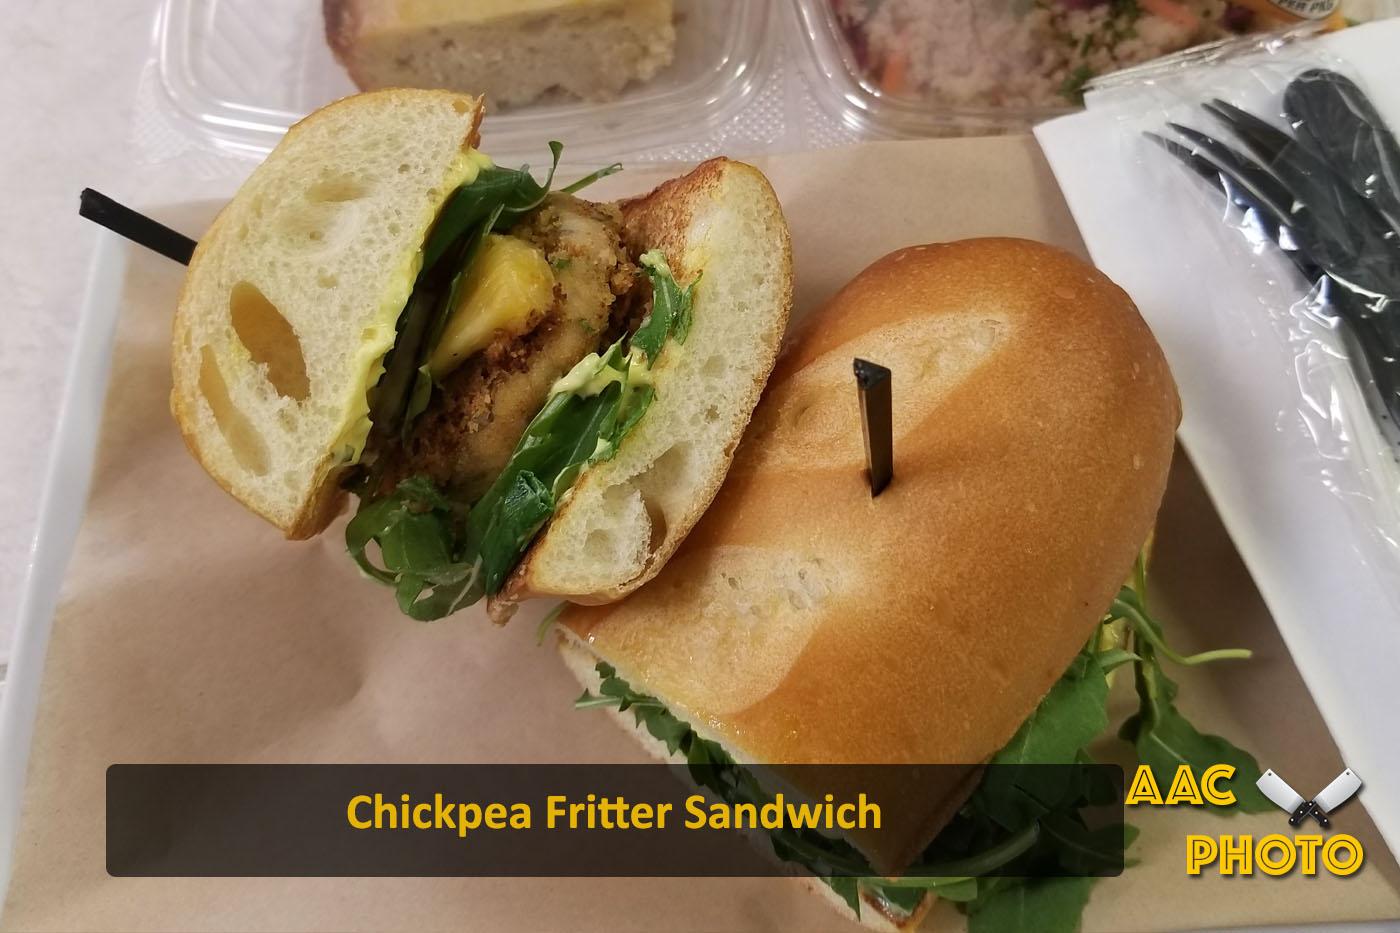 Chickpea Fritter Sandwich